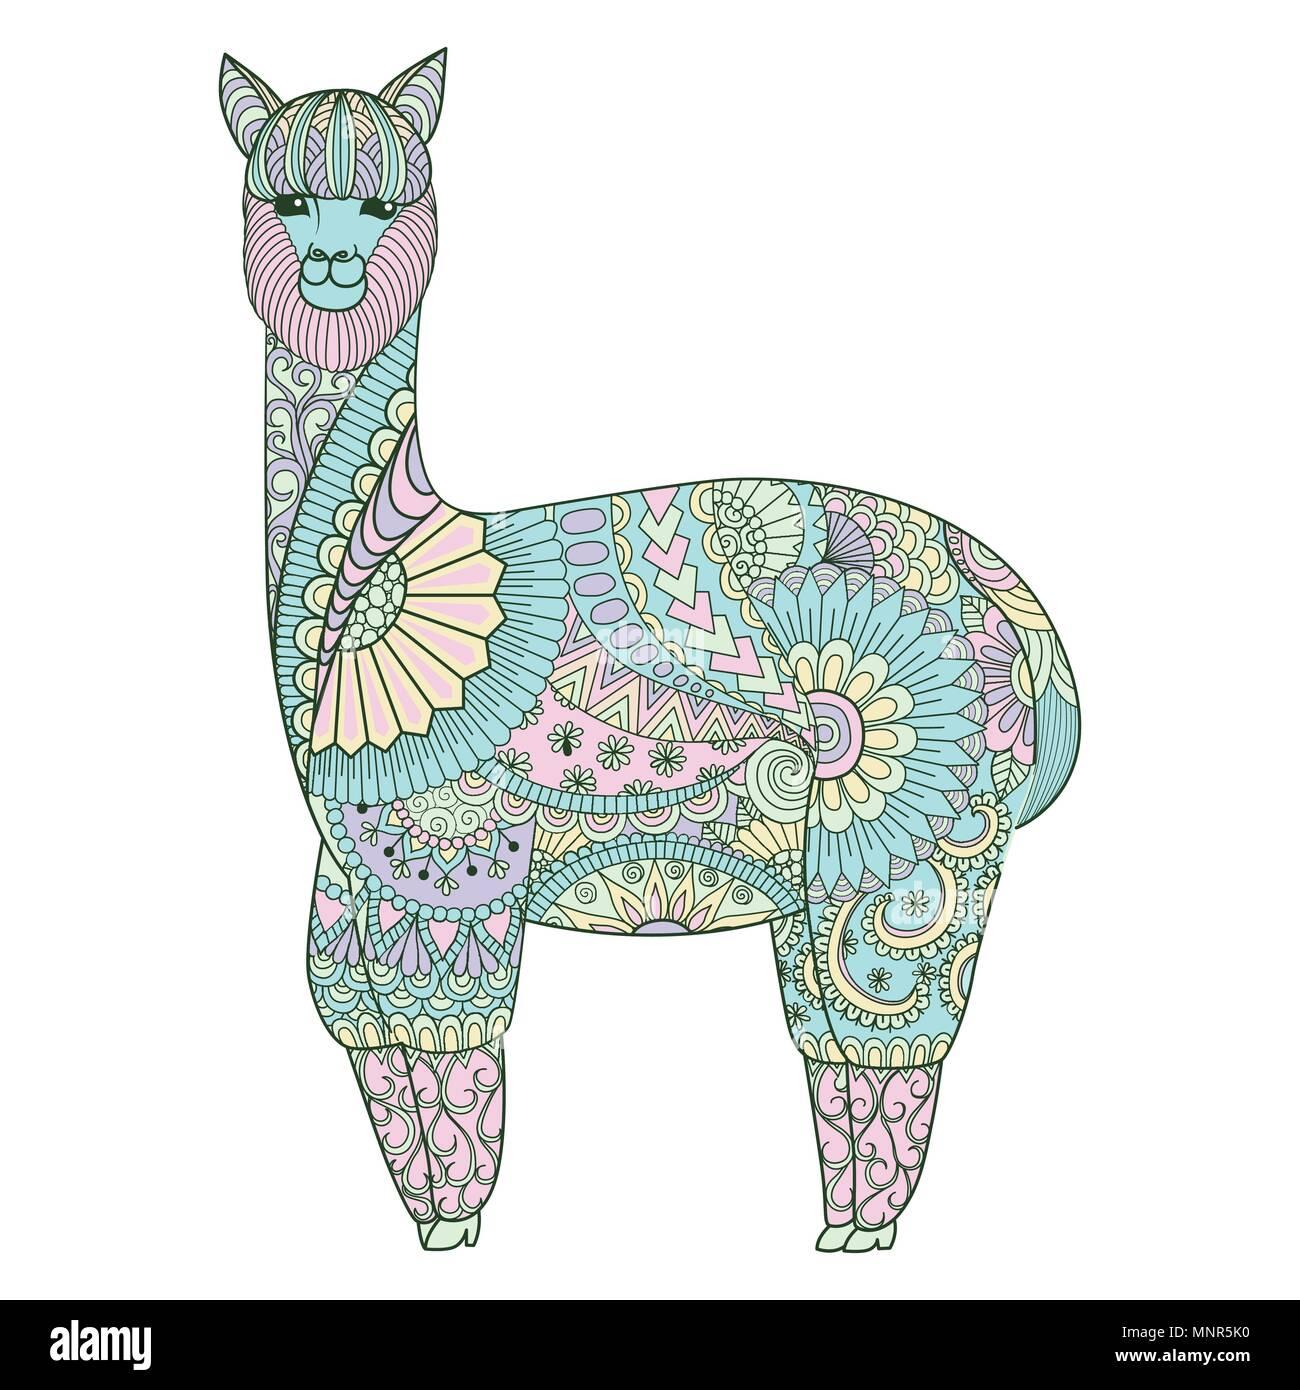 Cute Coloring Lama Zentangle Art For Design Element Stock